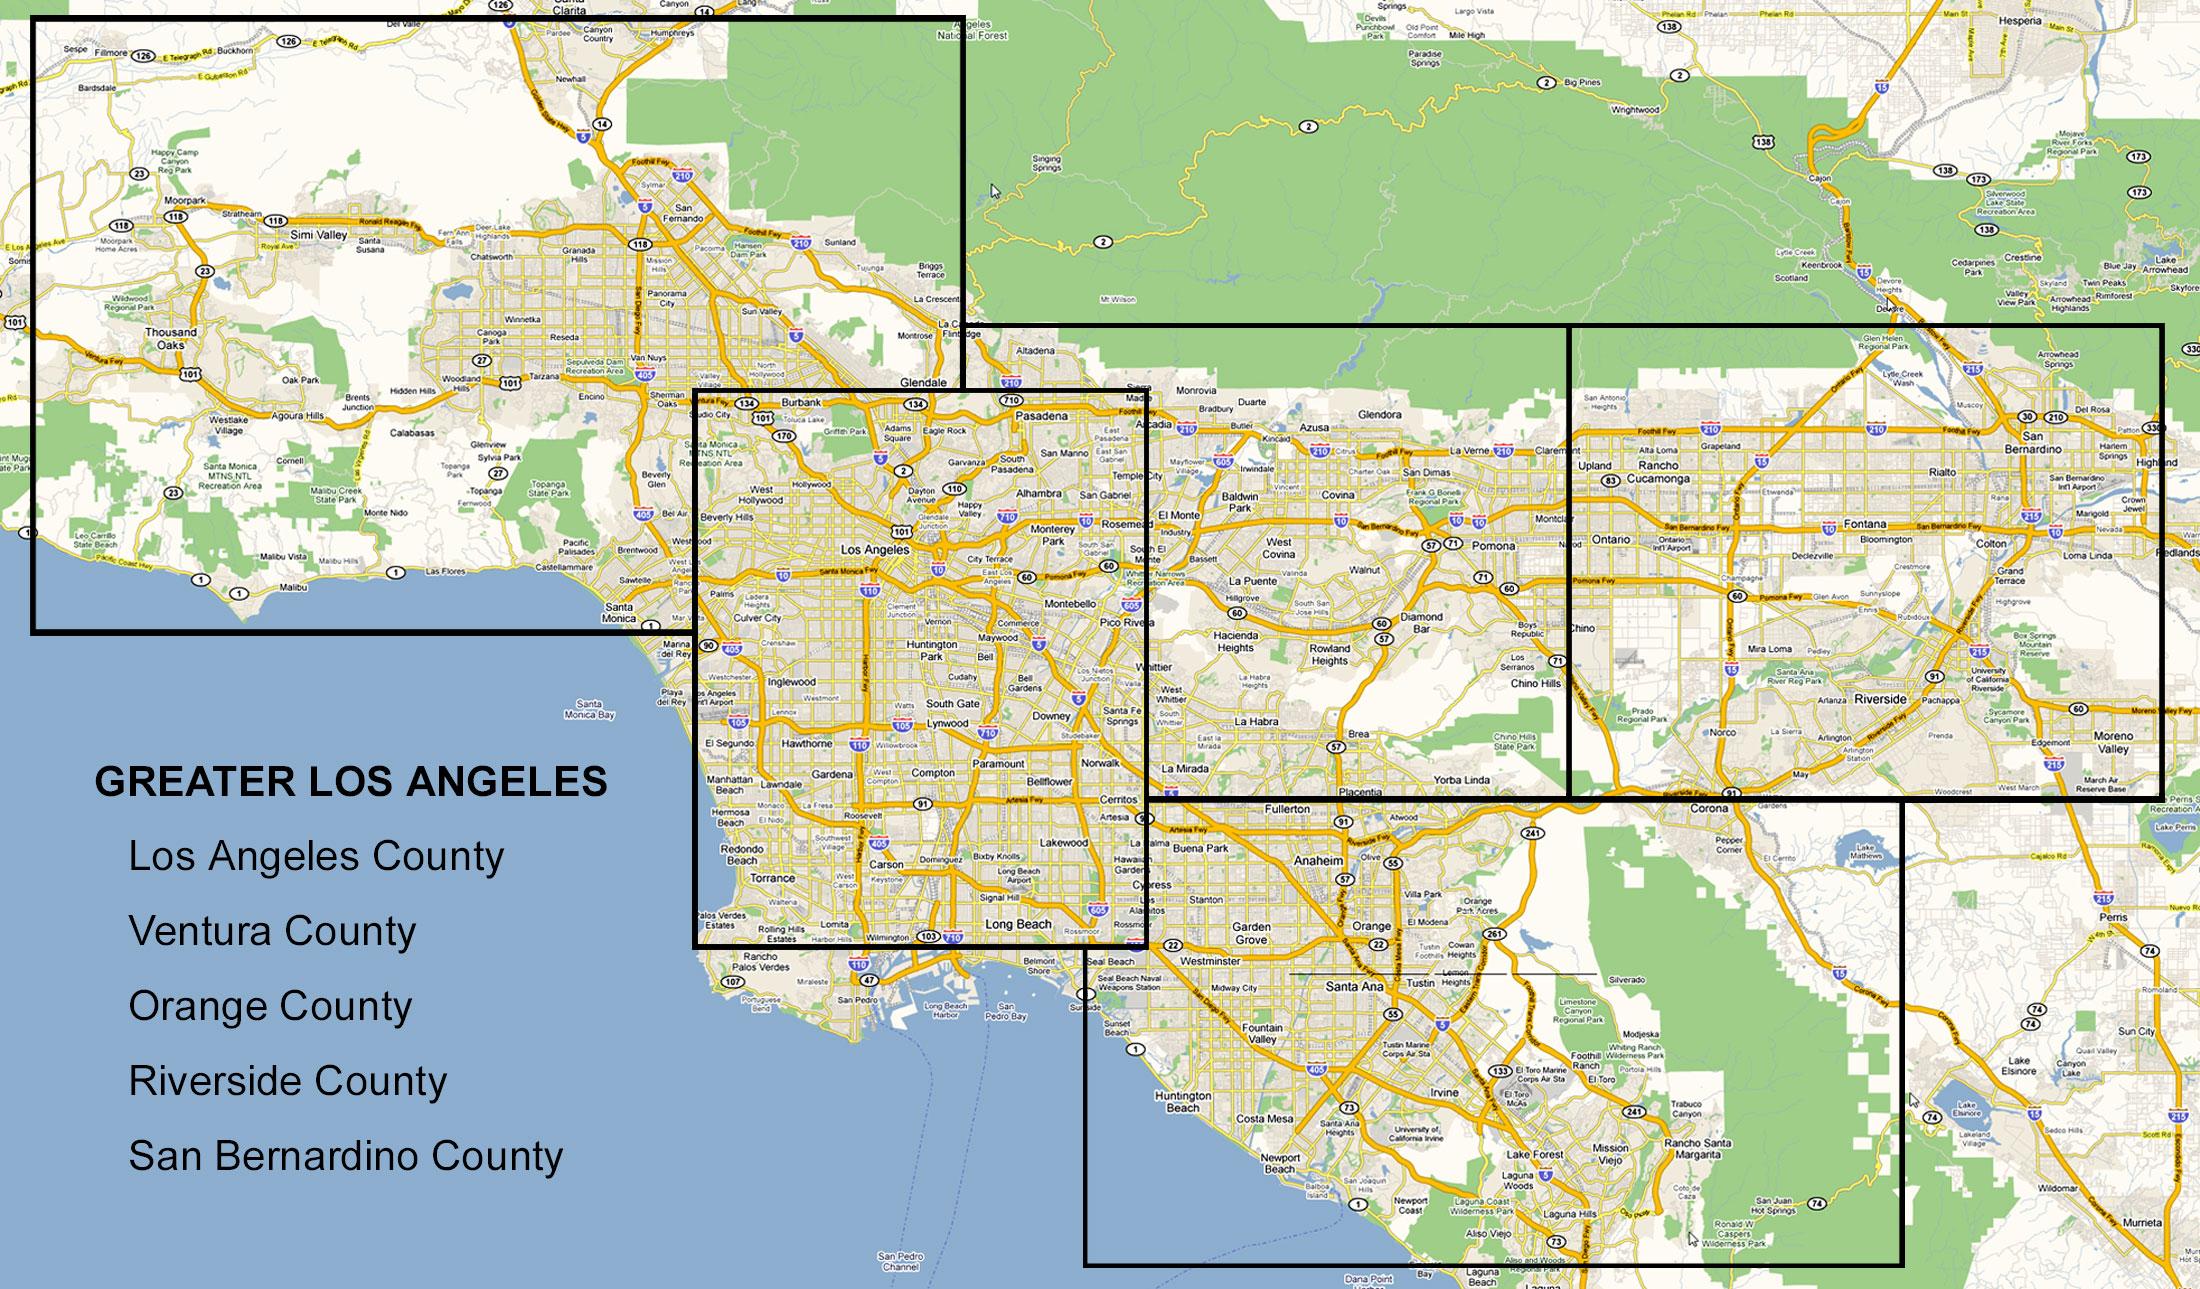 Карта Большого Лос-Анджелеса